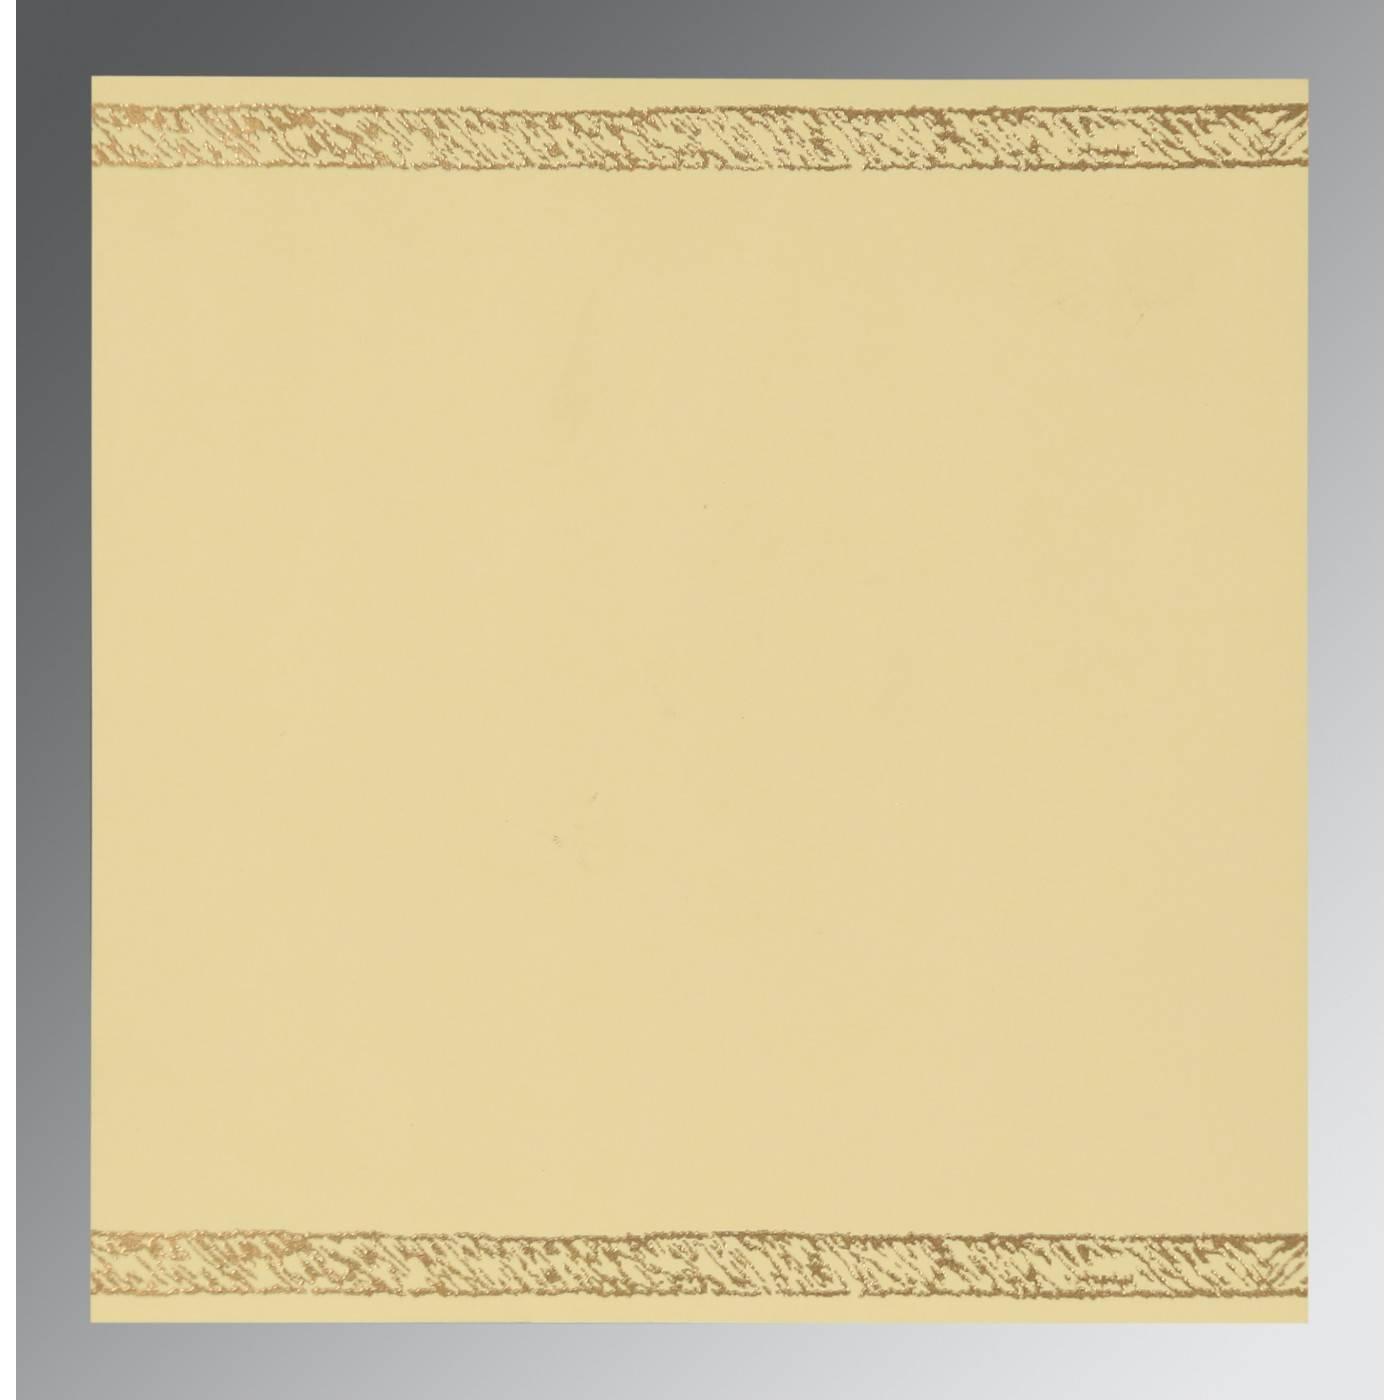 BURNT ORANGE SHIMMERY FLORAL THEMED - EMBOSSED WEDDING CARD : CG-8209D - IndianWeddingCards